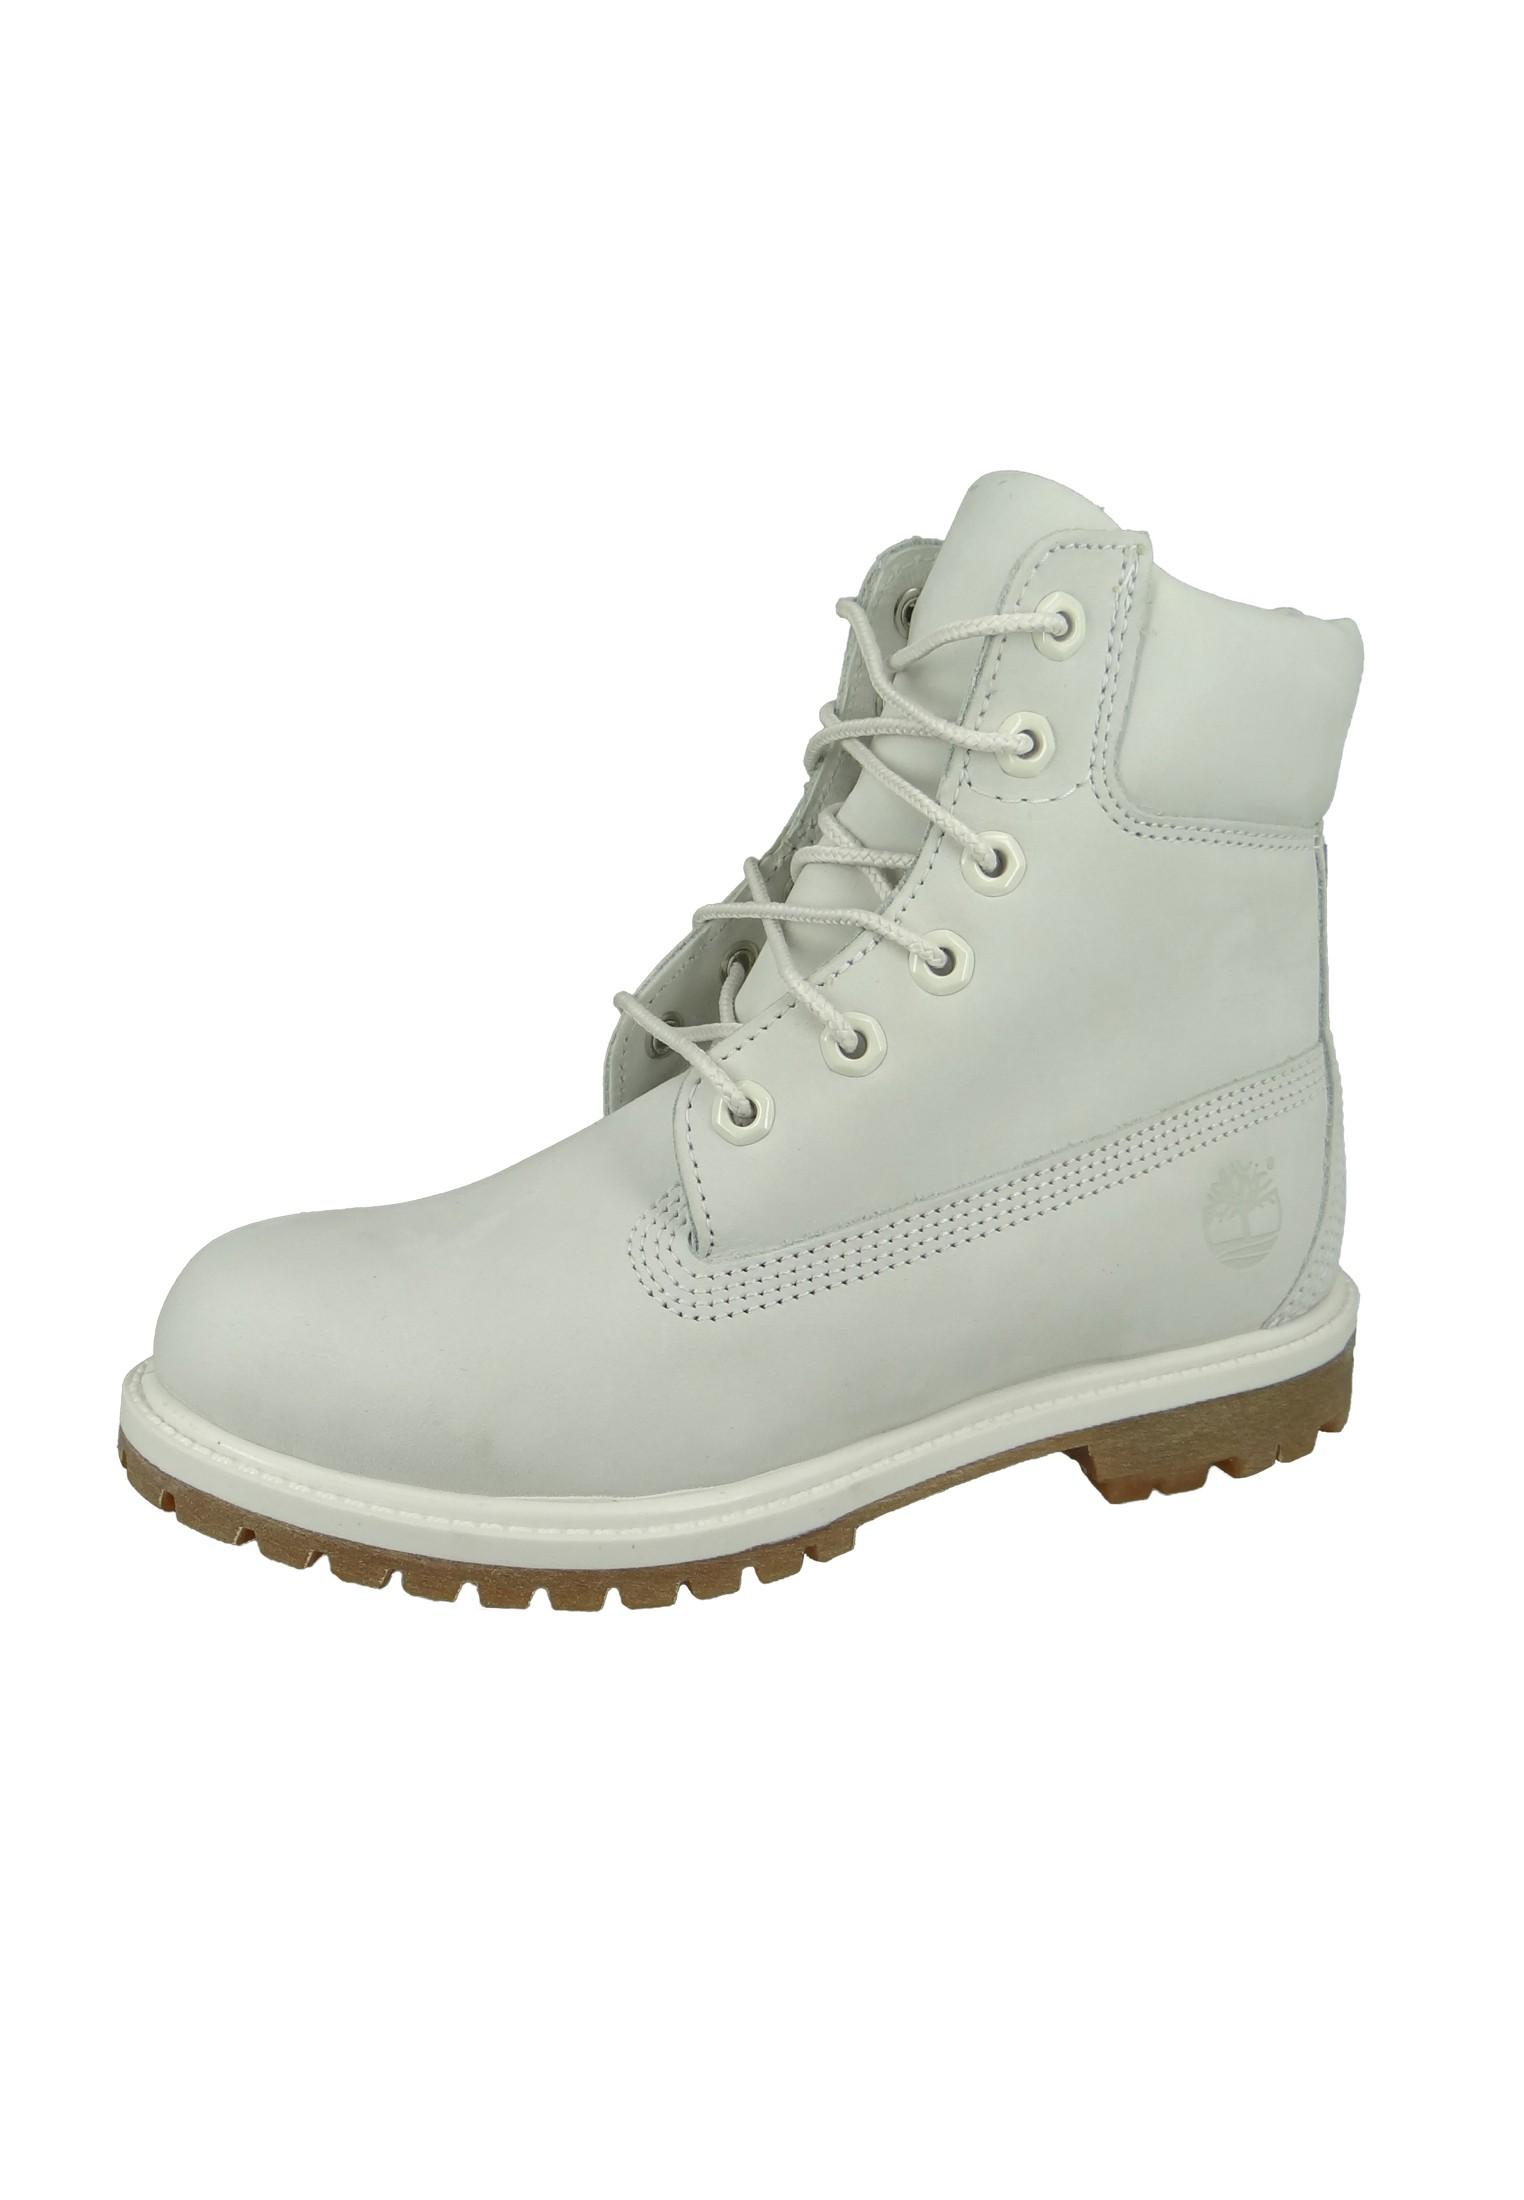 7585768545 Timberland Damen Stiefel 6 Inch Premium Boot Leder Vaporous Grey Waterbuck  Grau A196R